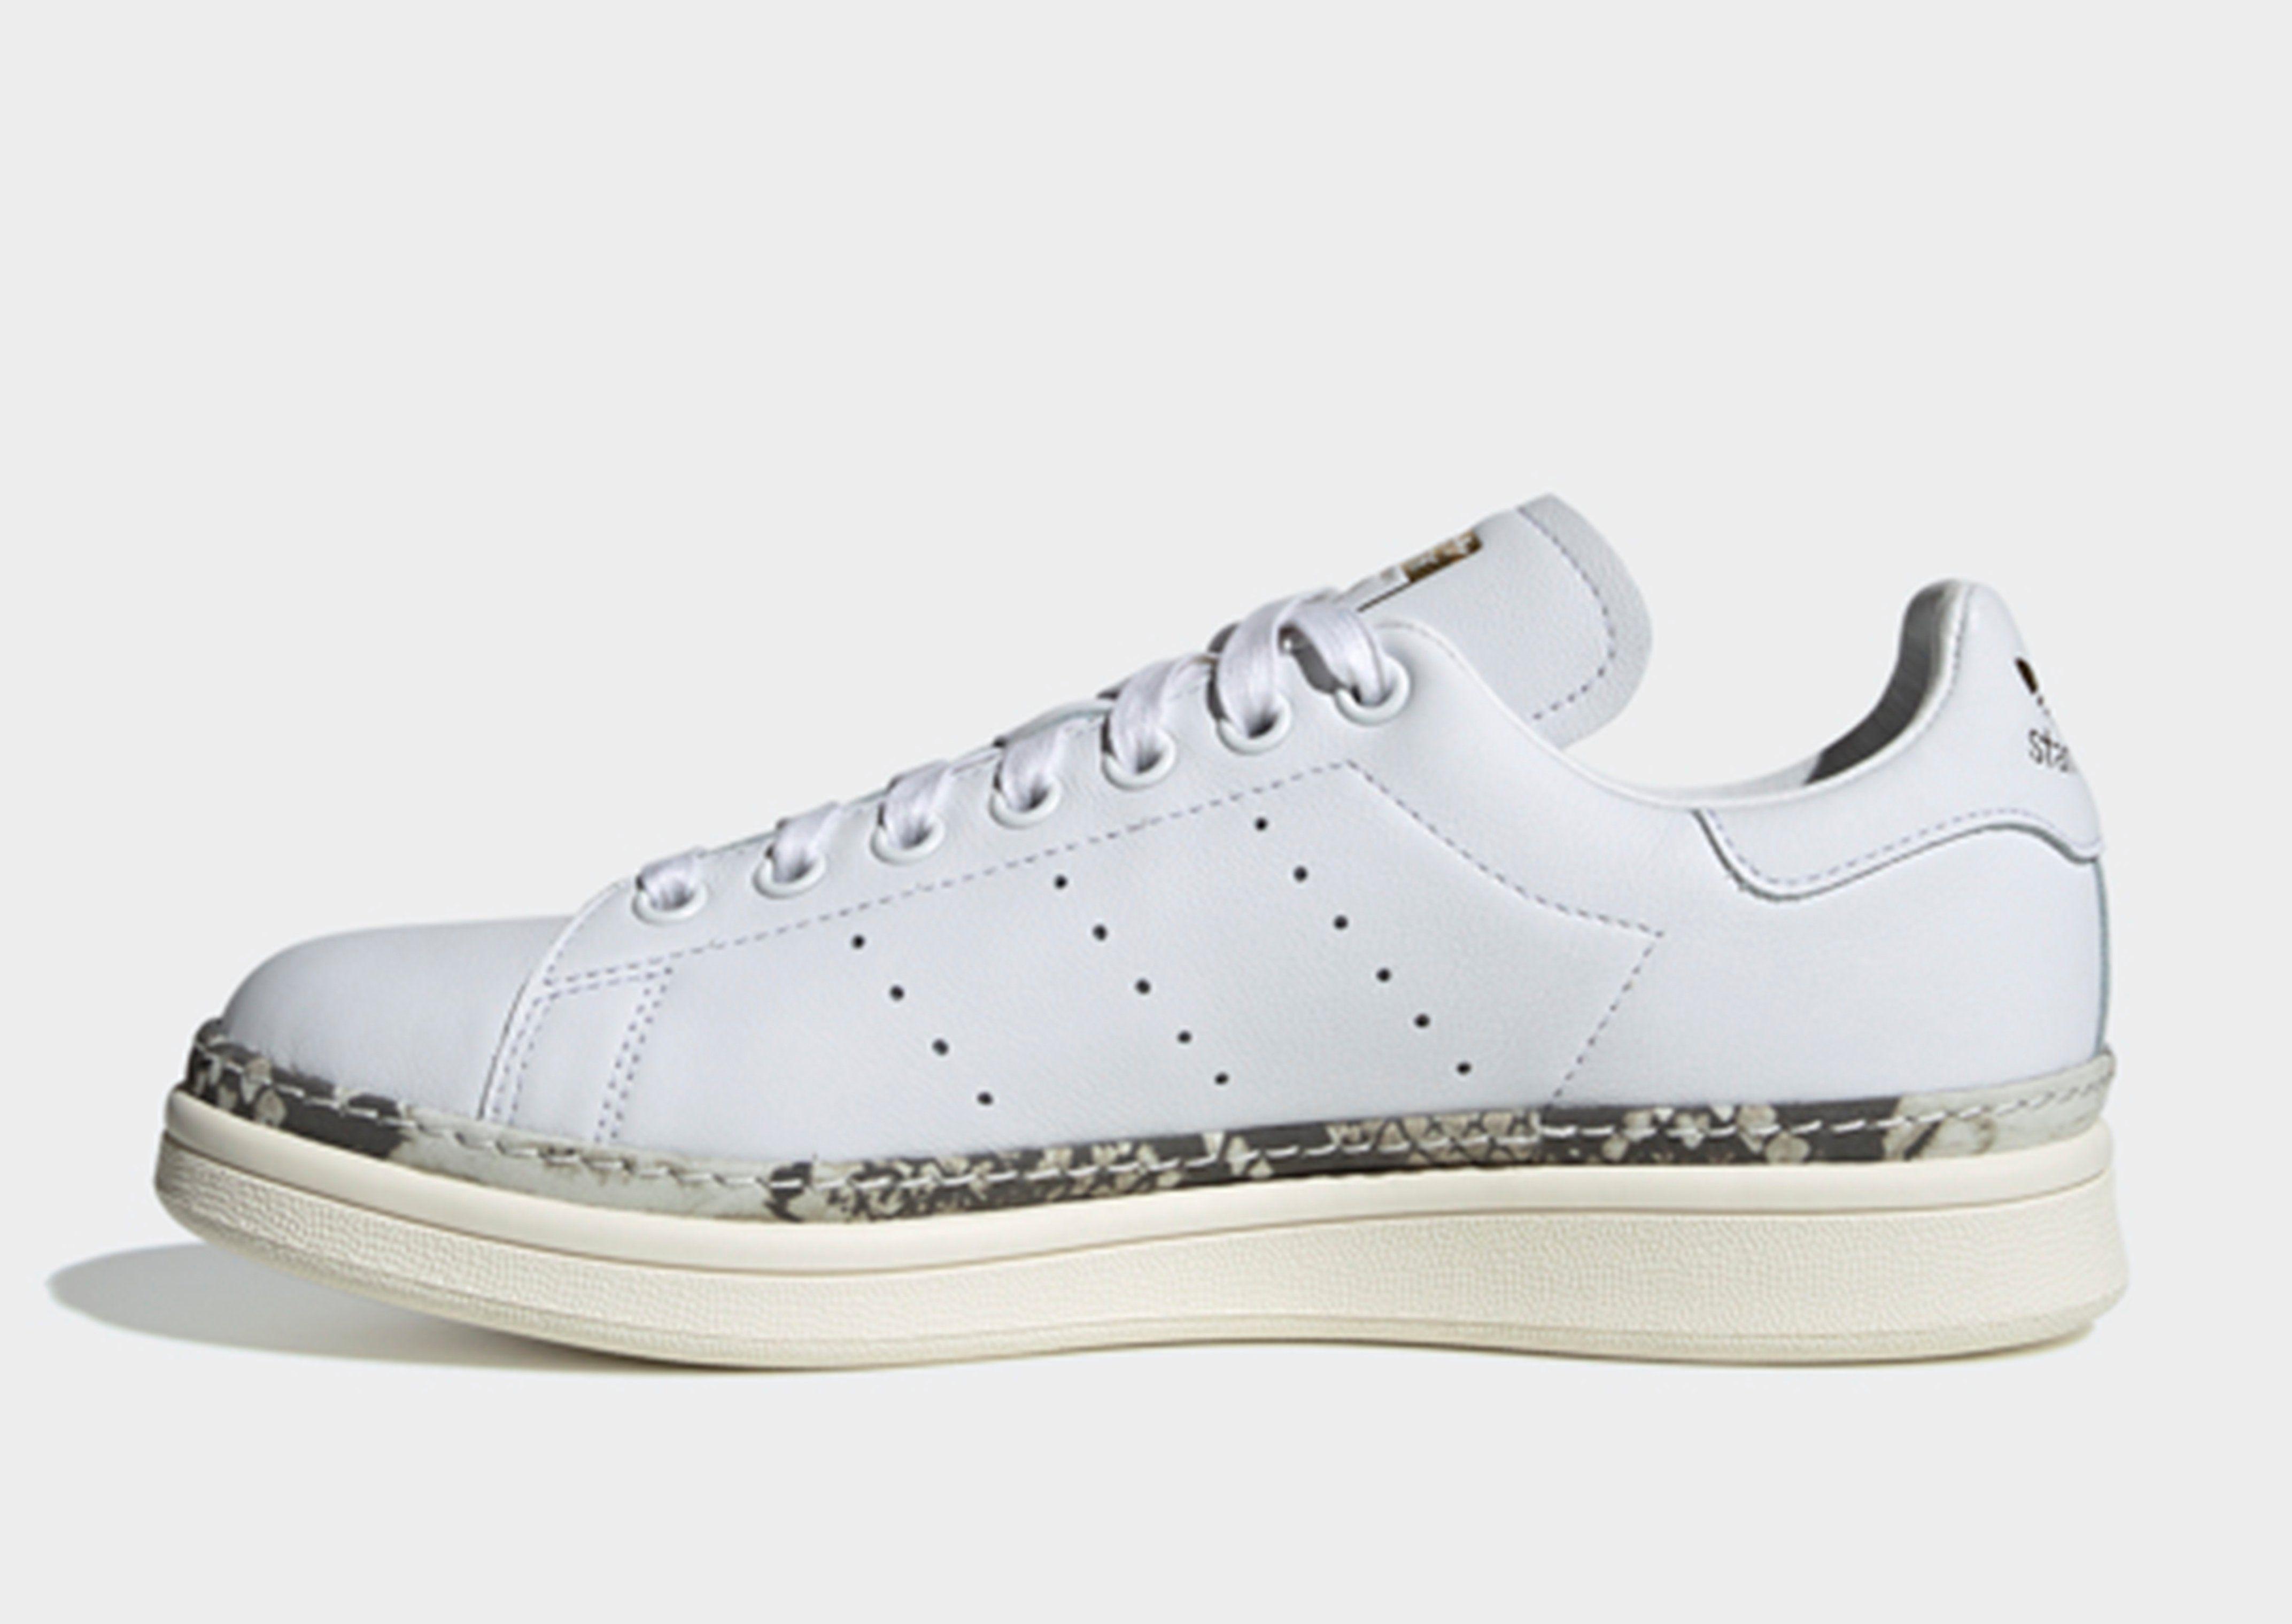 9b13e3748002 ADIDAS Stan Smith New Bold Shoes